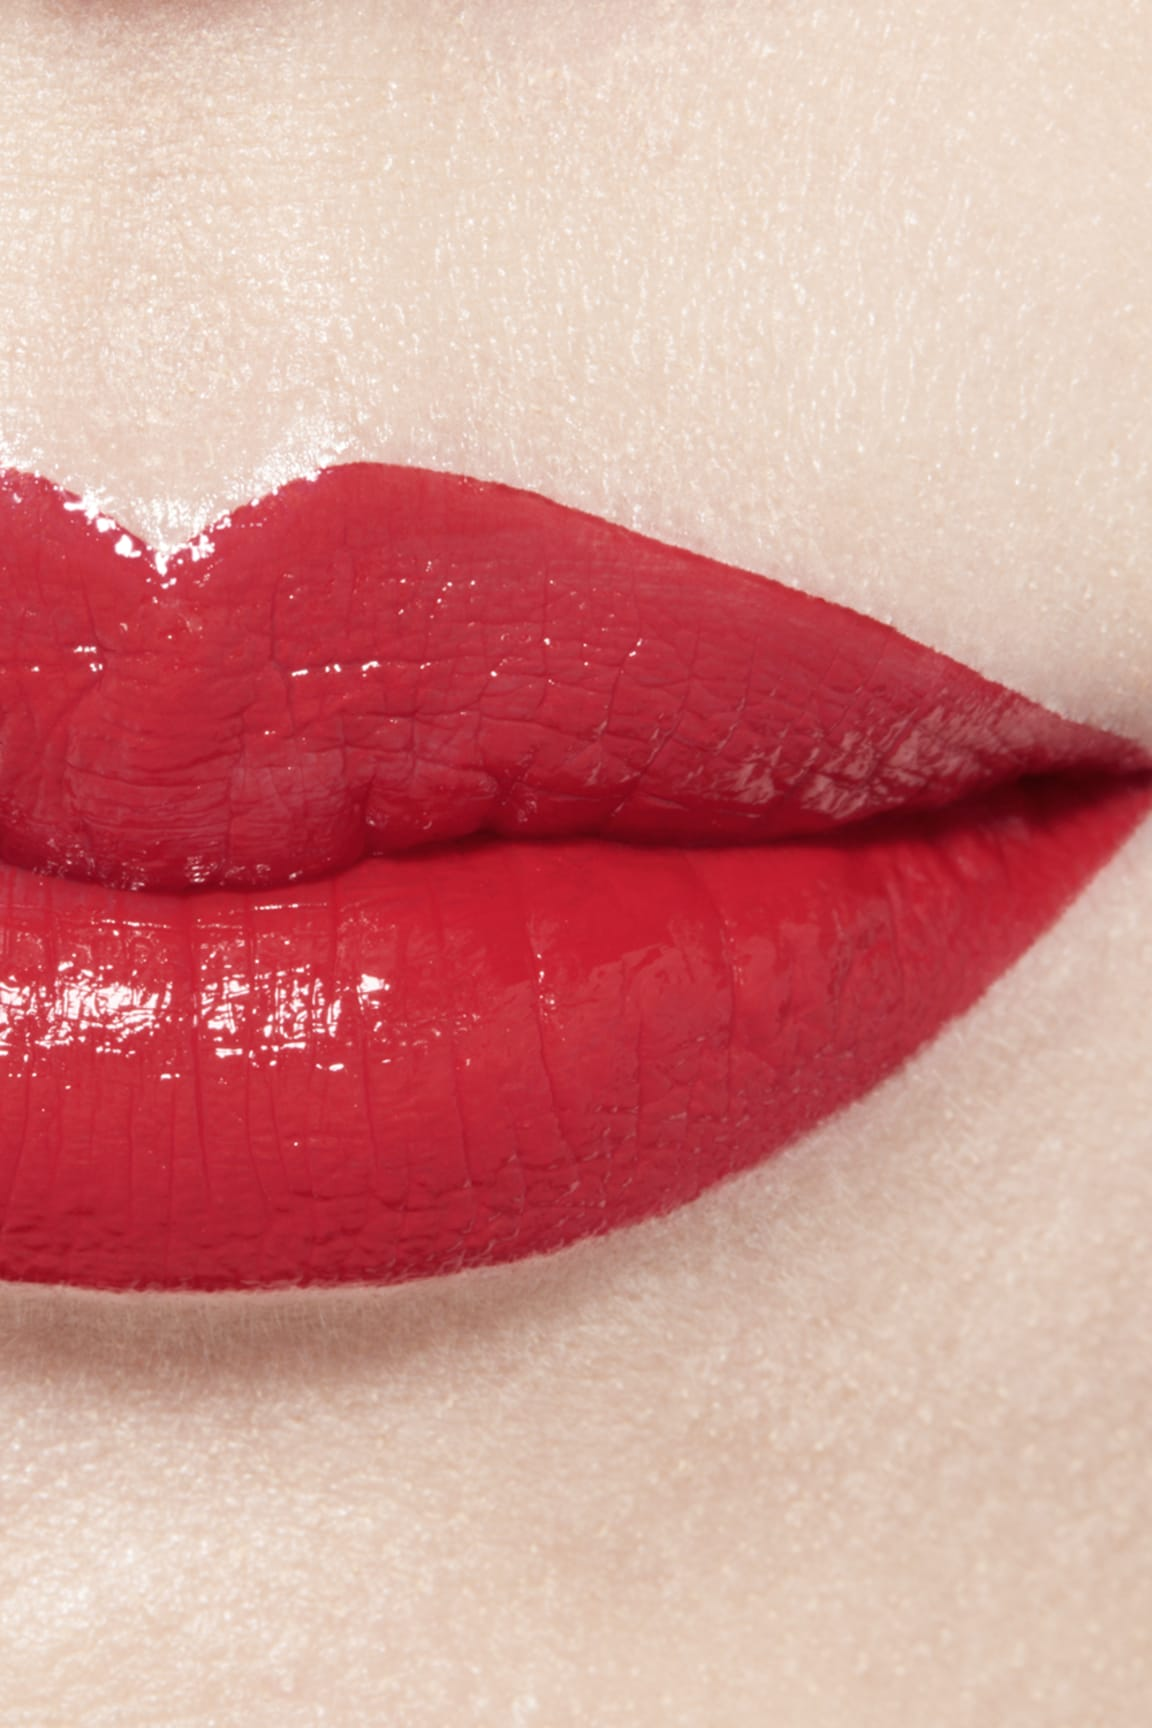 Anwendung Make-up-Bild 1 - ROUGE COCO BLOOM 130 - BLOSSOM